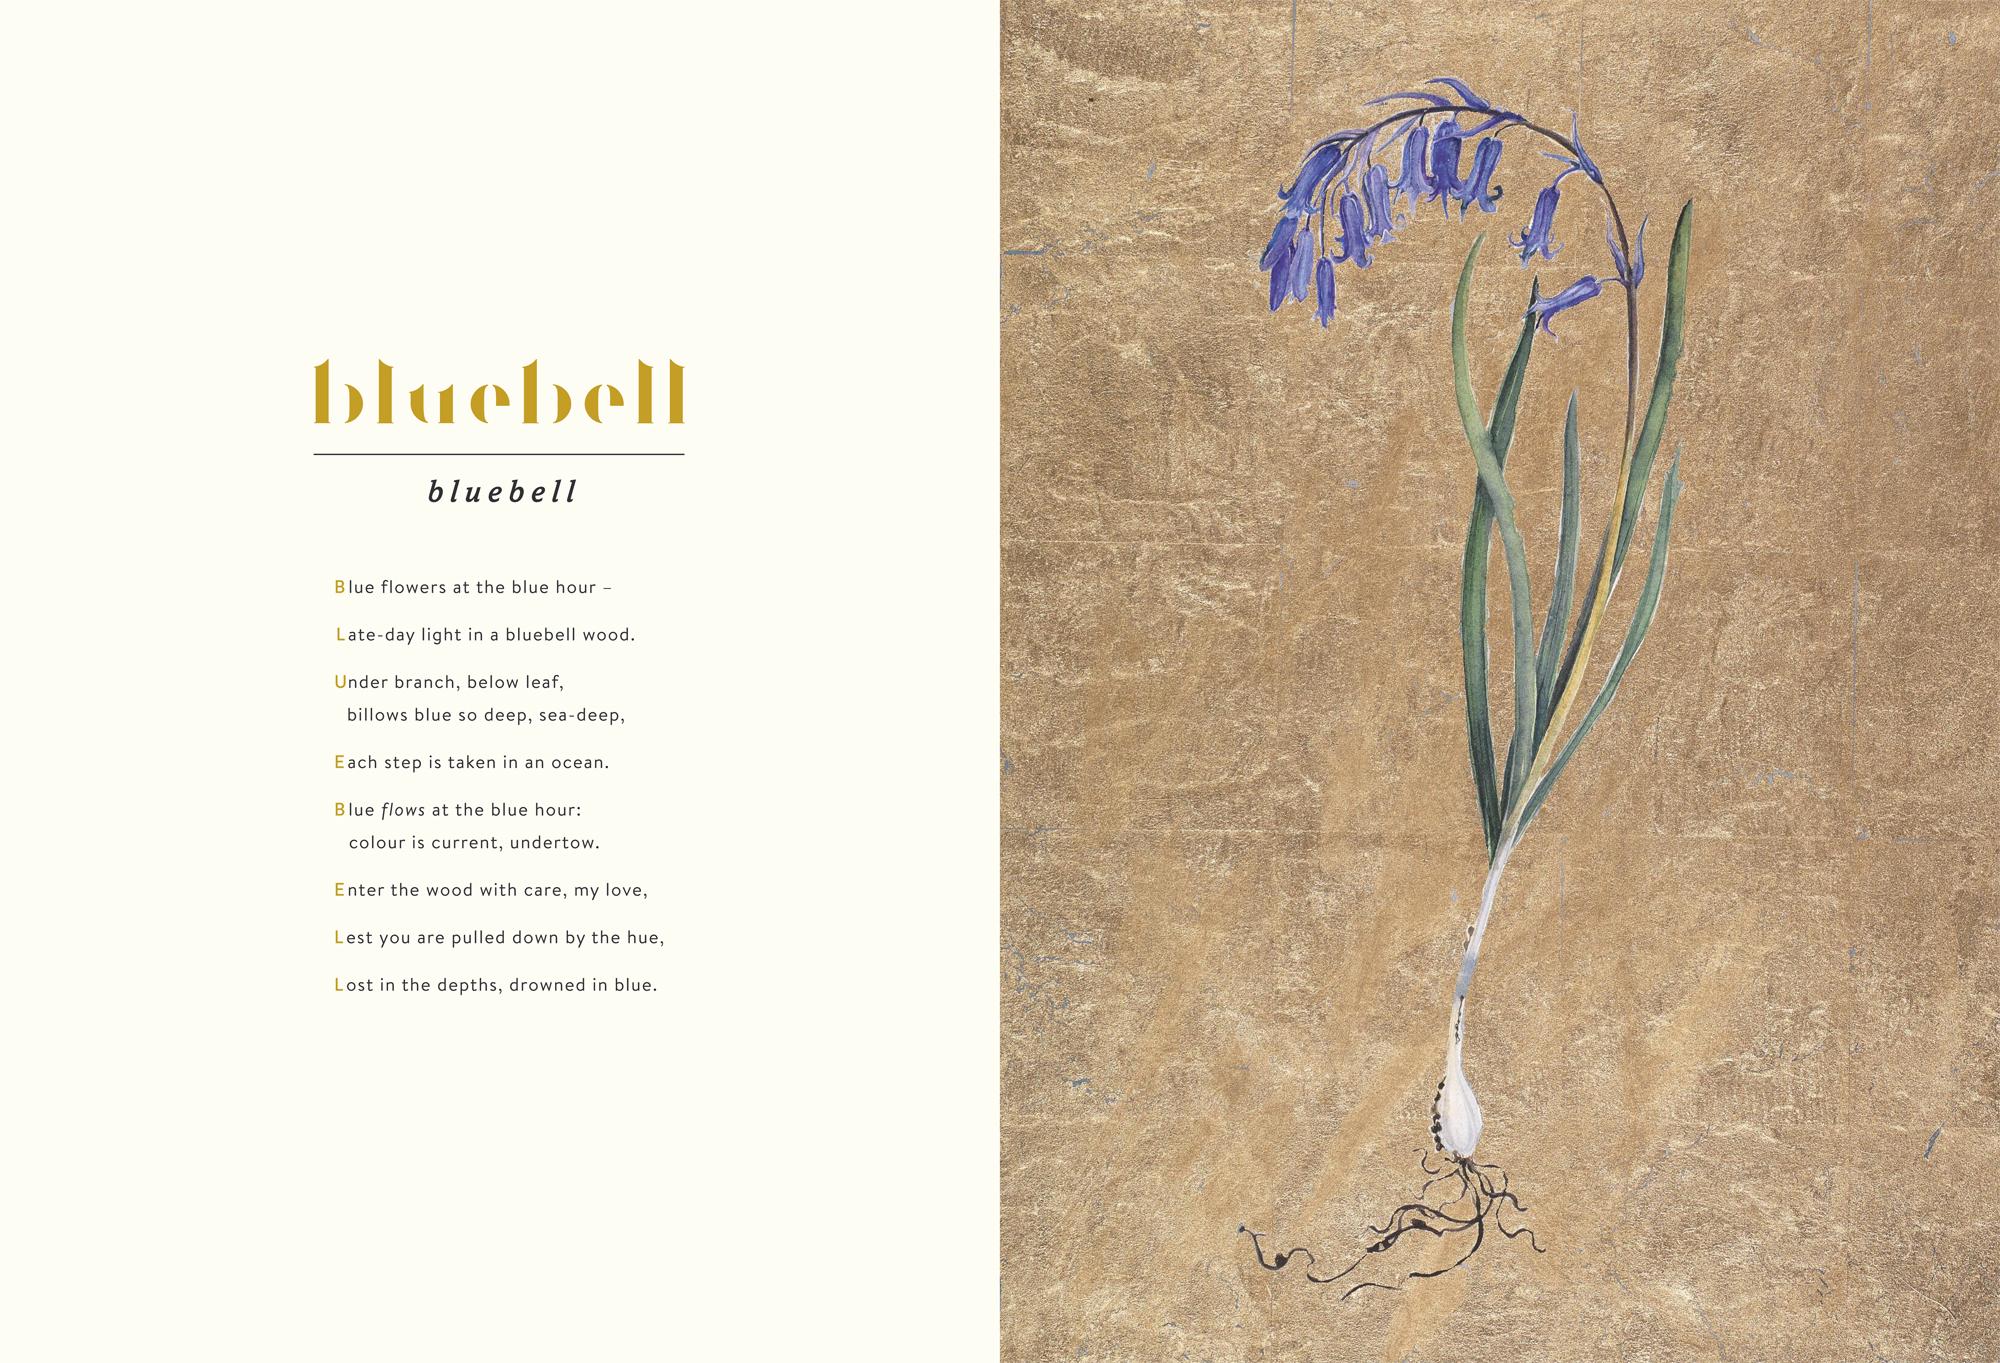 Bluebell © Jackie Morris & Robert Macfarlane